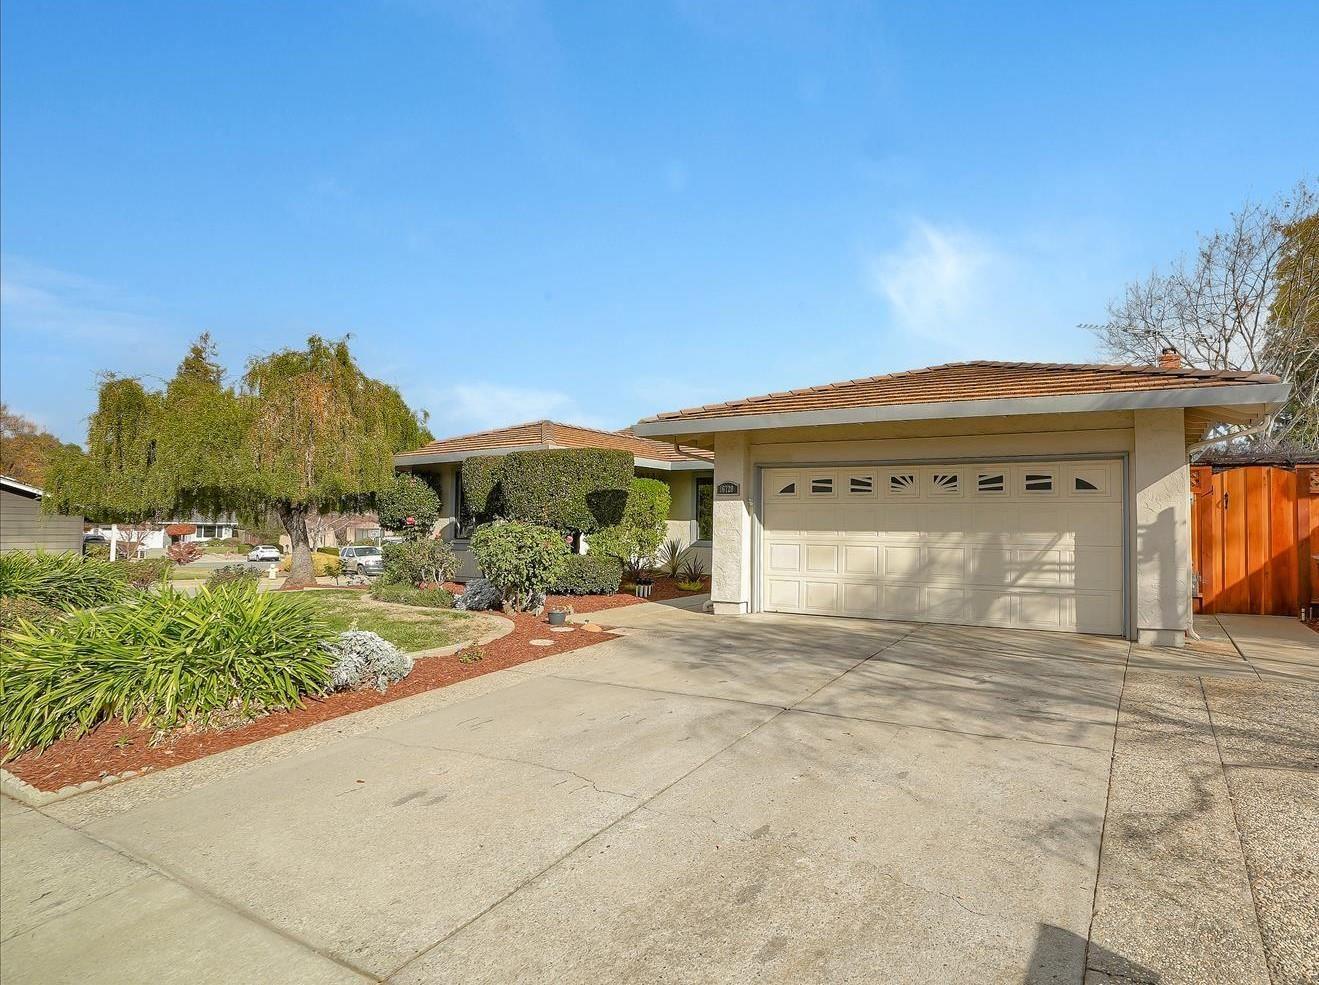 Photo for 16720 Wild Oak WAY, MORGAN HILL, CA 95037 (MLS # ML81823169)